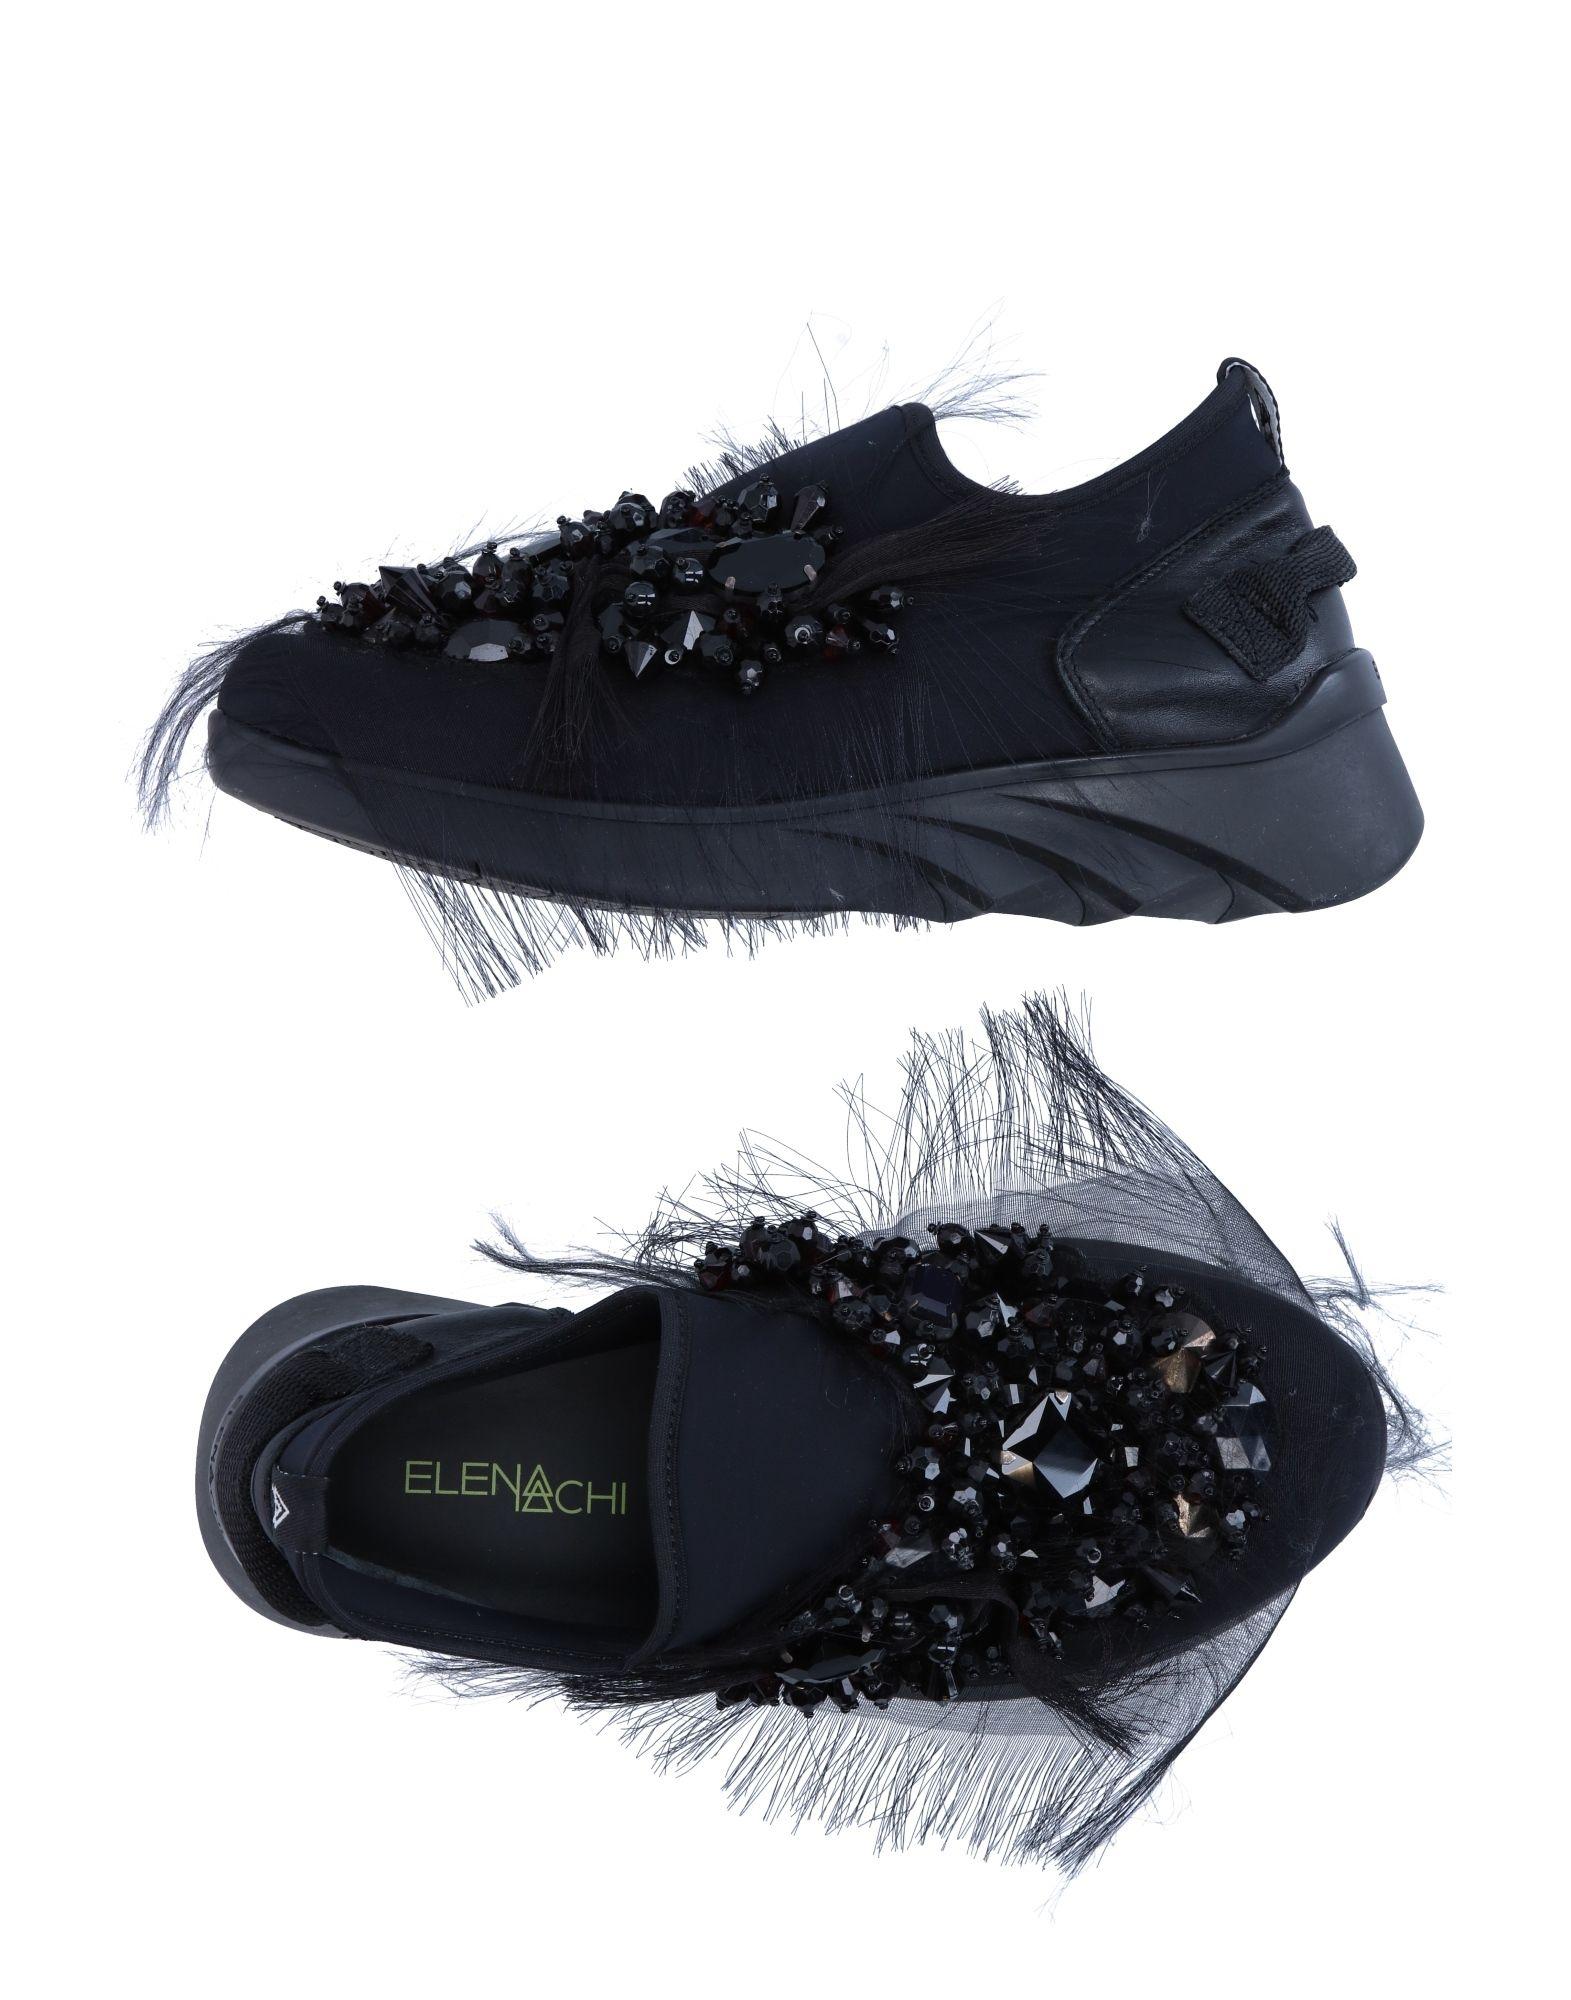 ELENA IACHI Damen Low Sneakers & Tennisschuhe Farbe Schwarz Größe 5